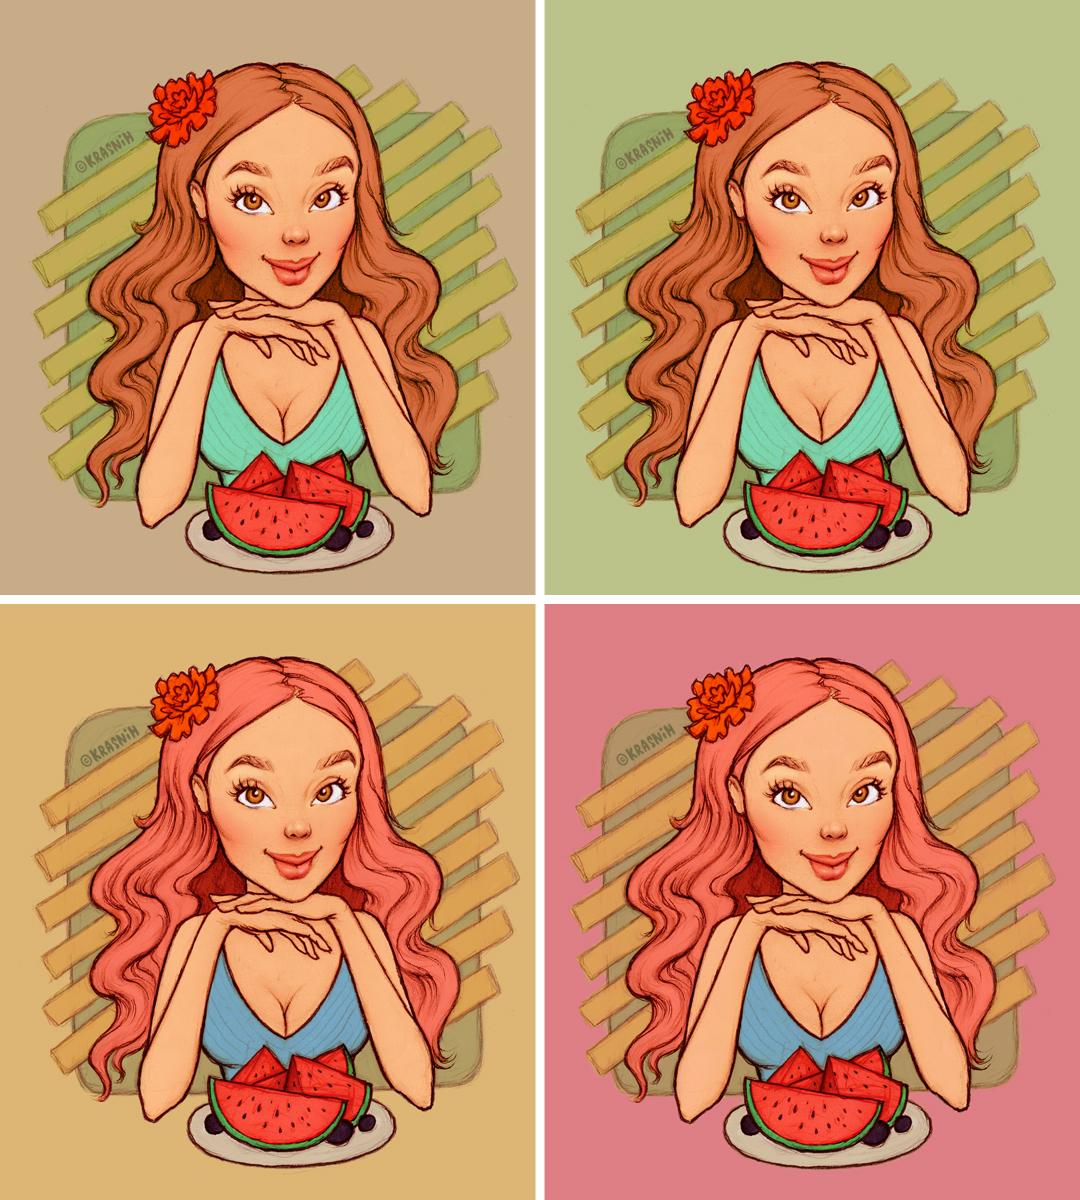 illustartion girl with watermelon by Krasnih Katerina